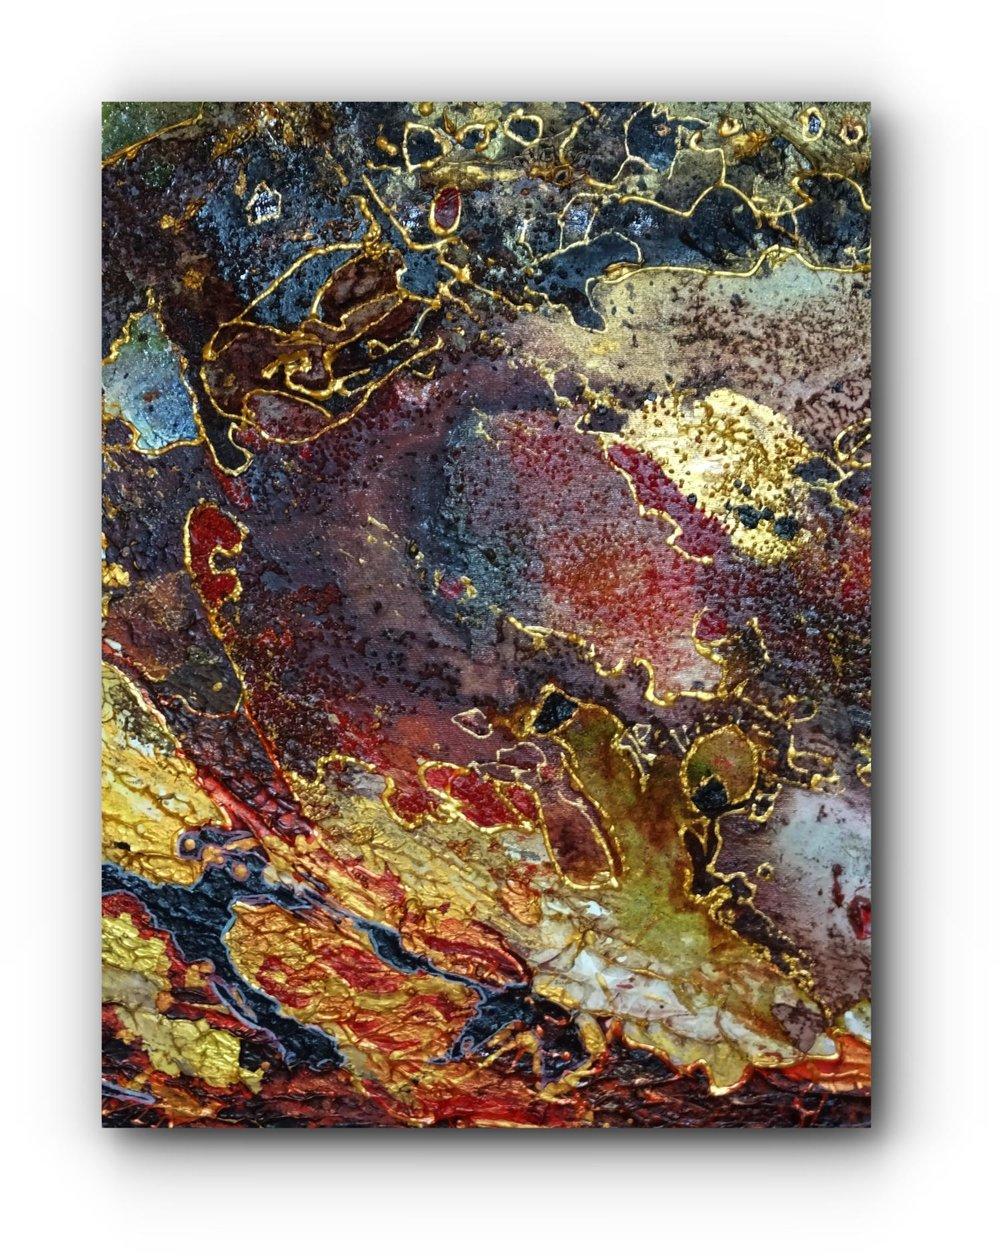 painting-detail-18-golden-sanctuary-artists-ingress-vortices.jpg